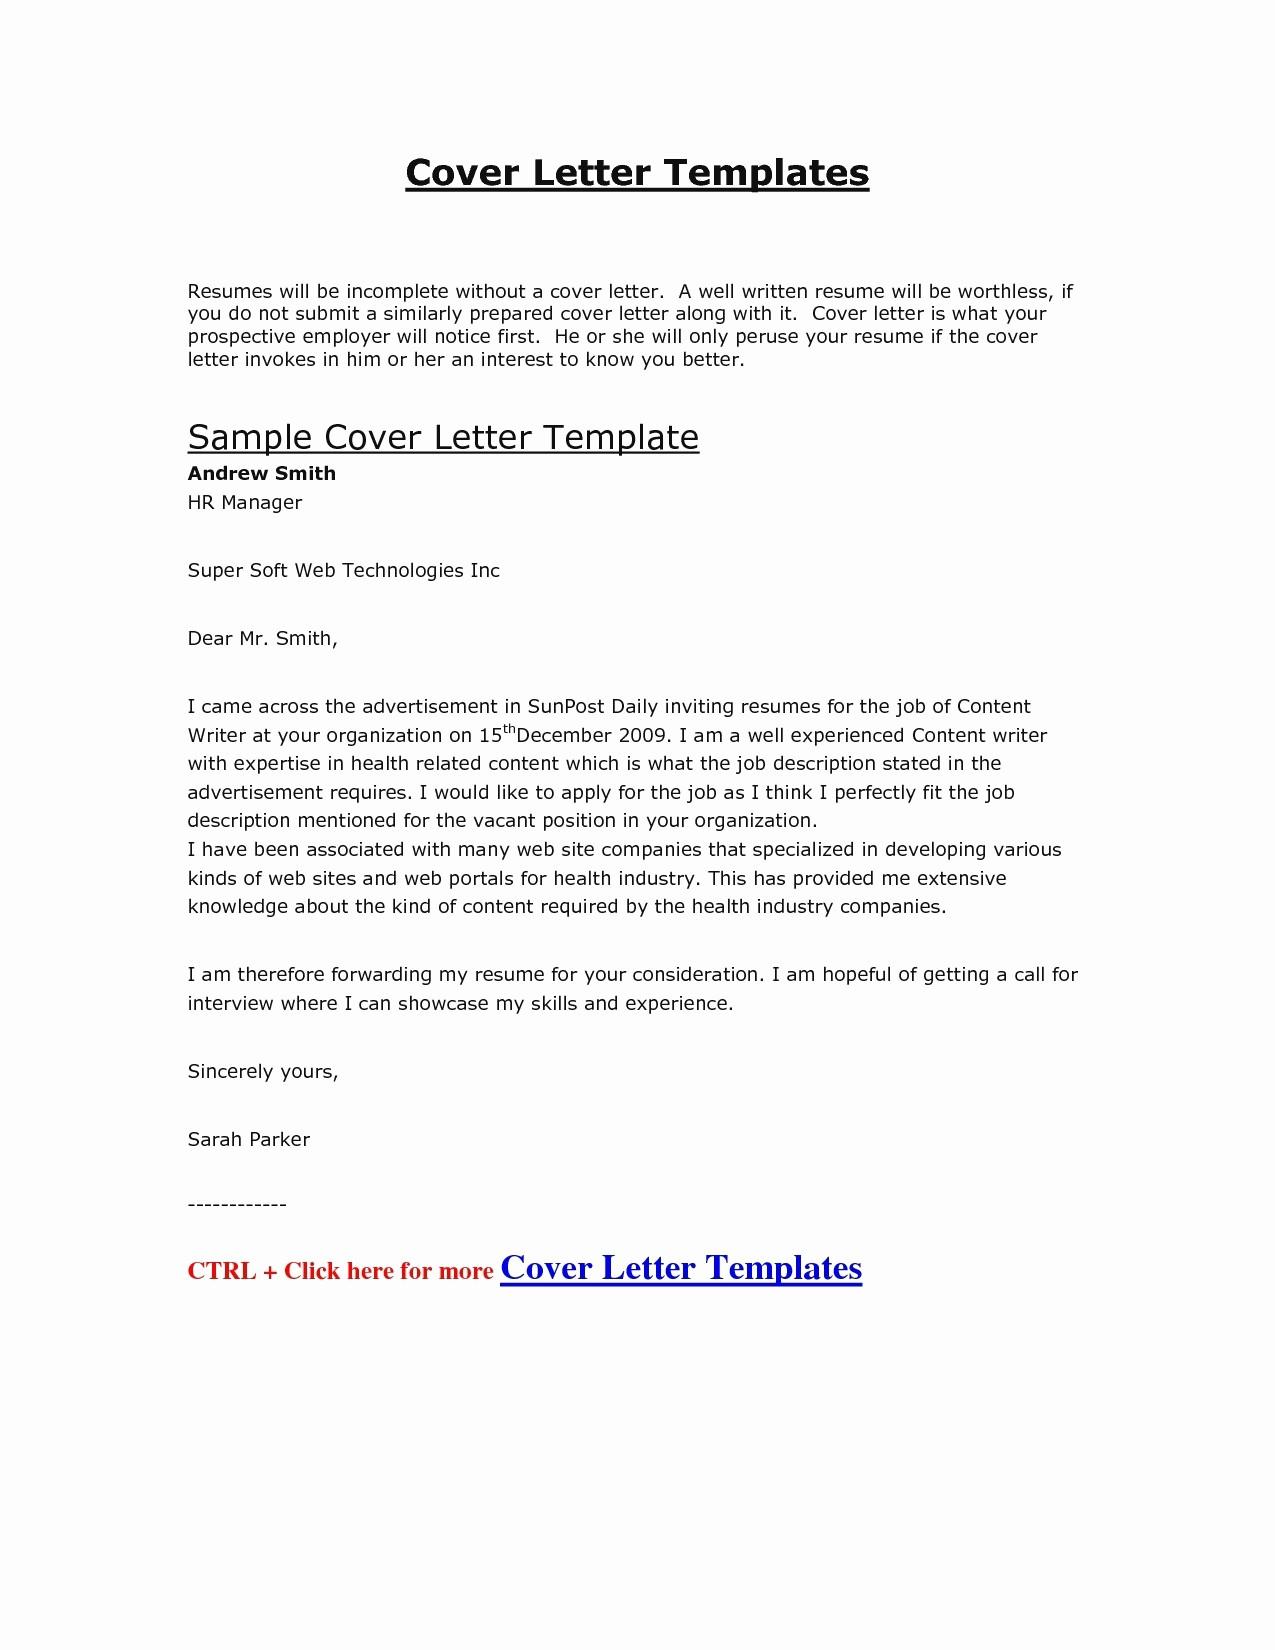 Cover Letter On A Resume Lovely Resume Cover Letter Template 2017